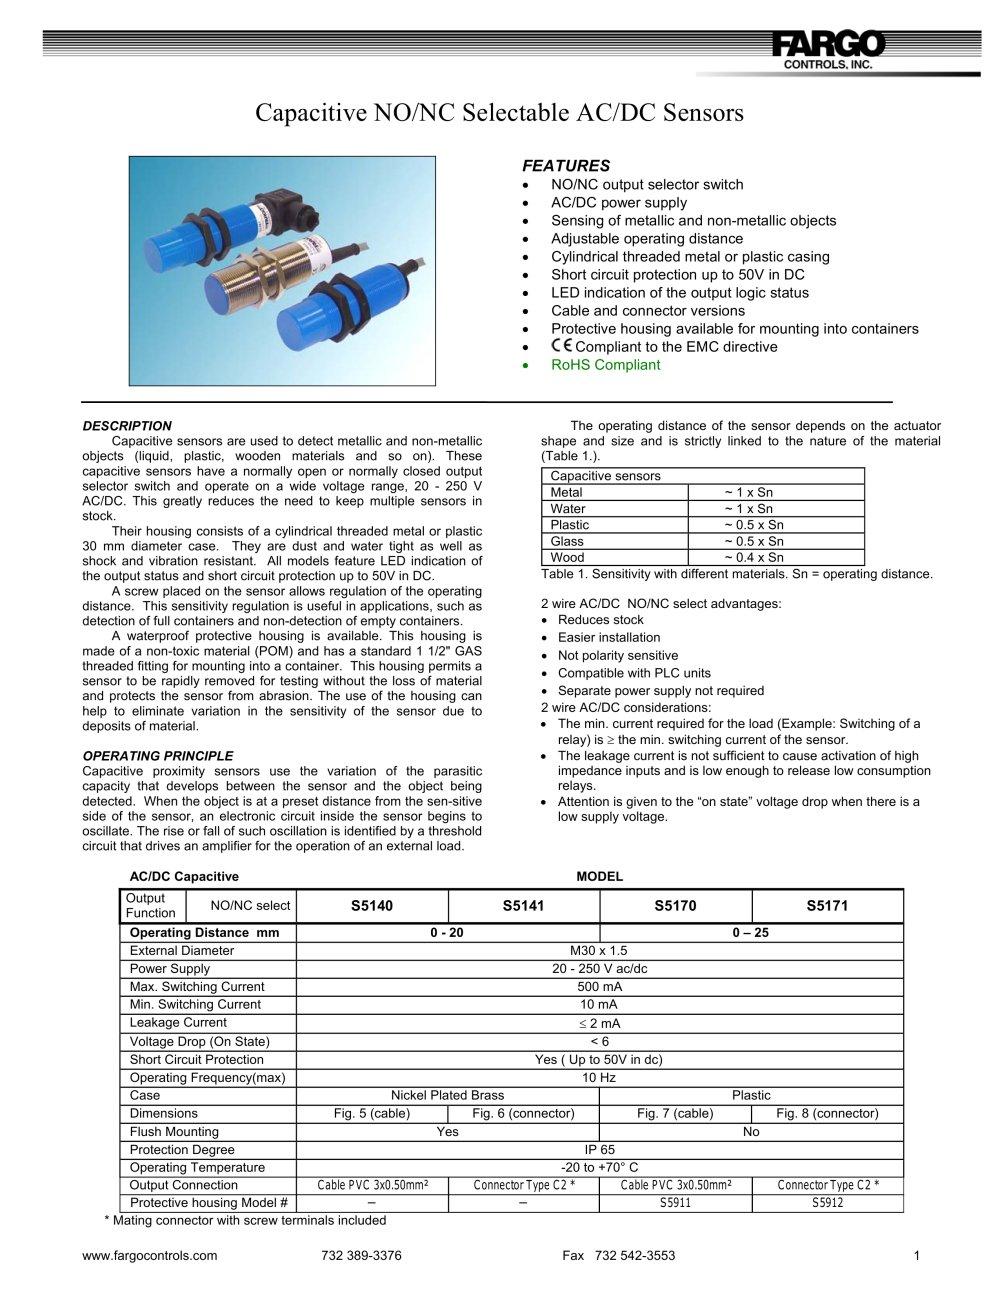 Capacitive No Nc Selectable Ac Dc Sensors Fargo Controls Inc Switch Circuit Diagram 1 2 Pages